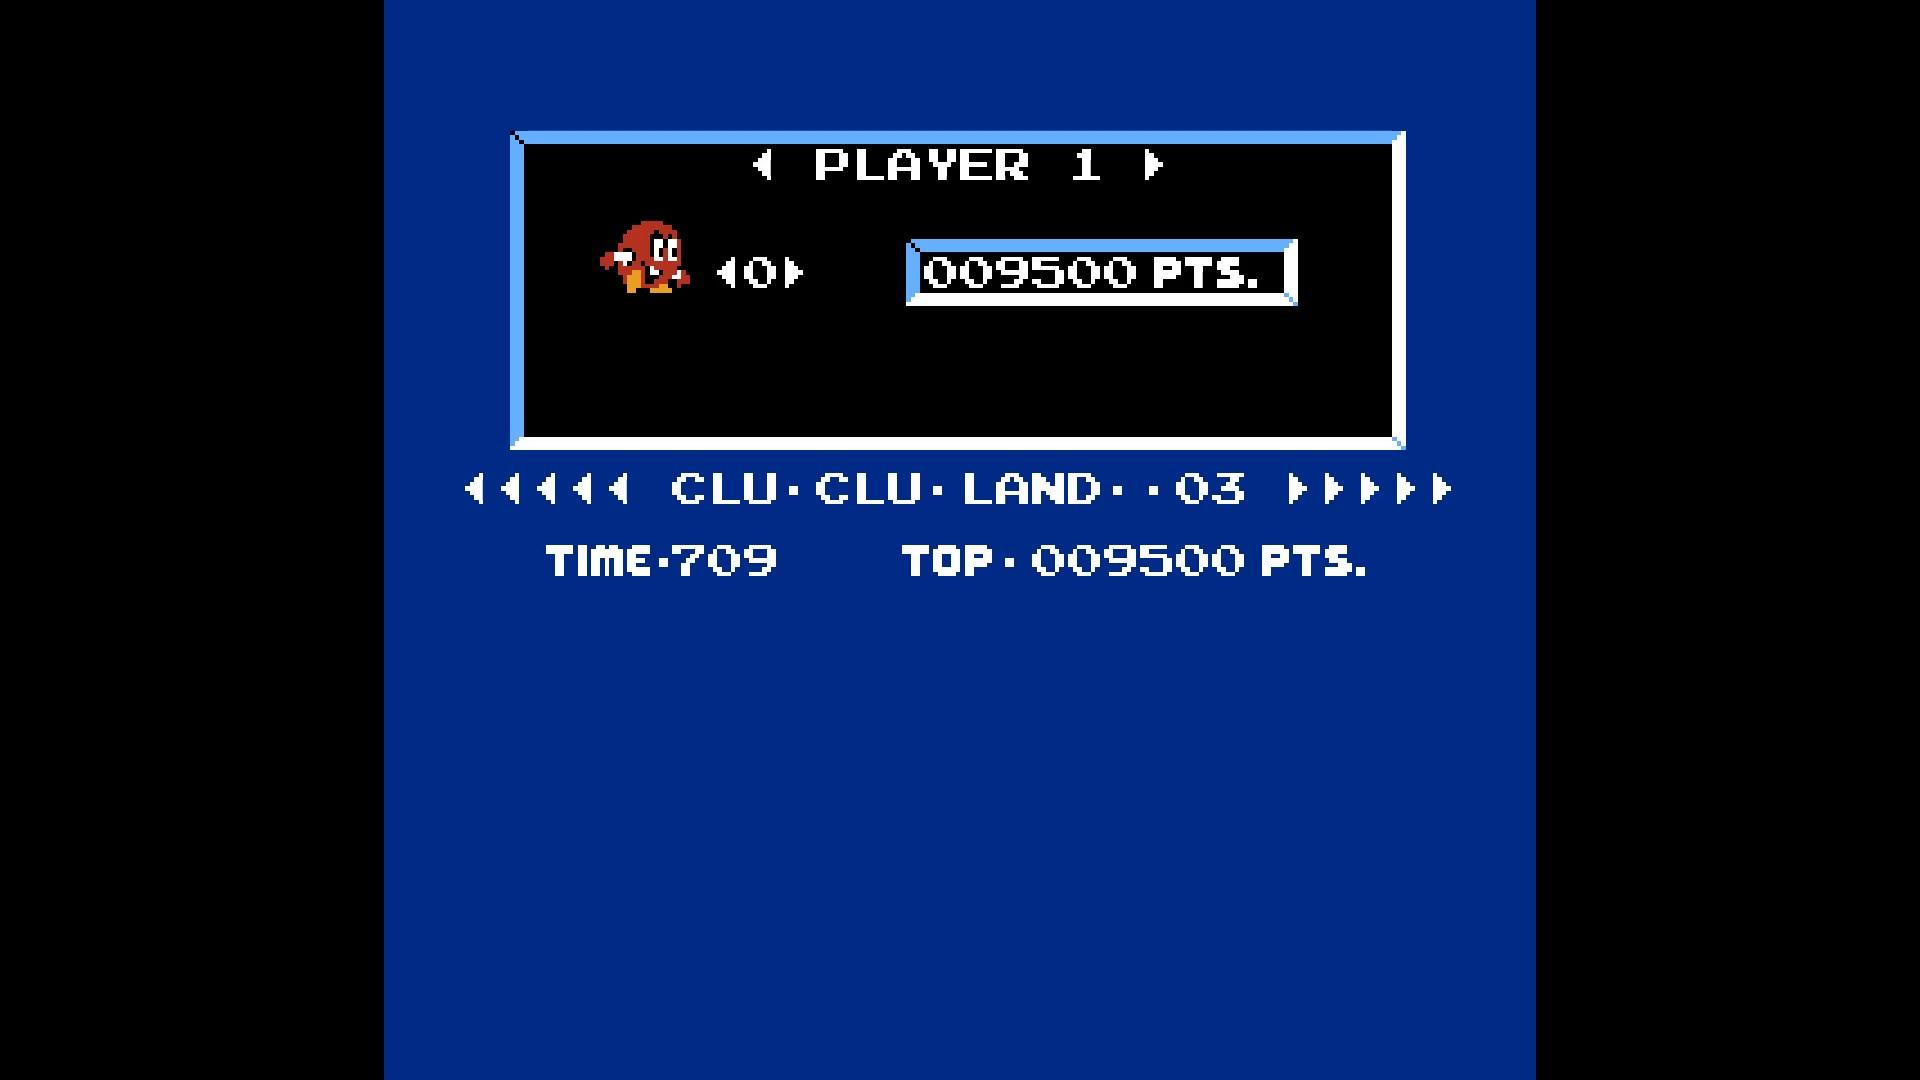 Clu Clu Land 9,500 points